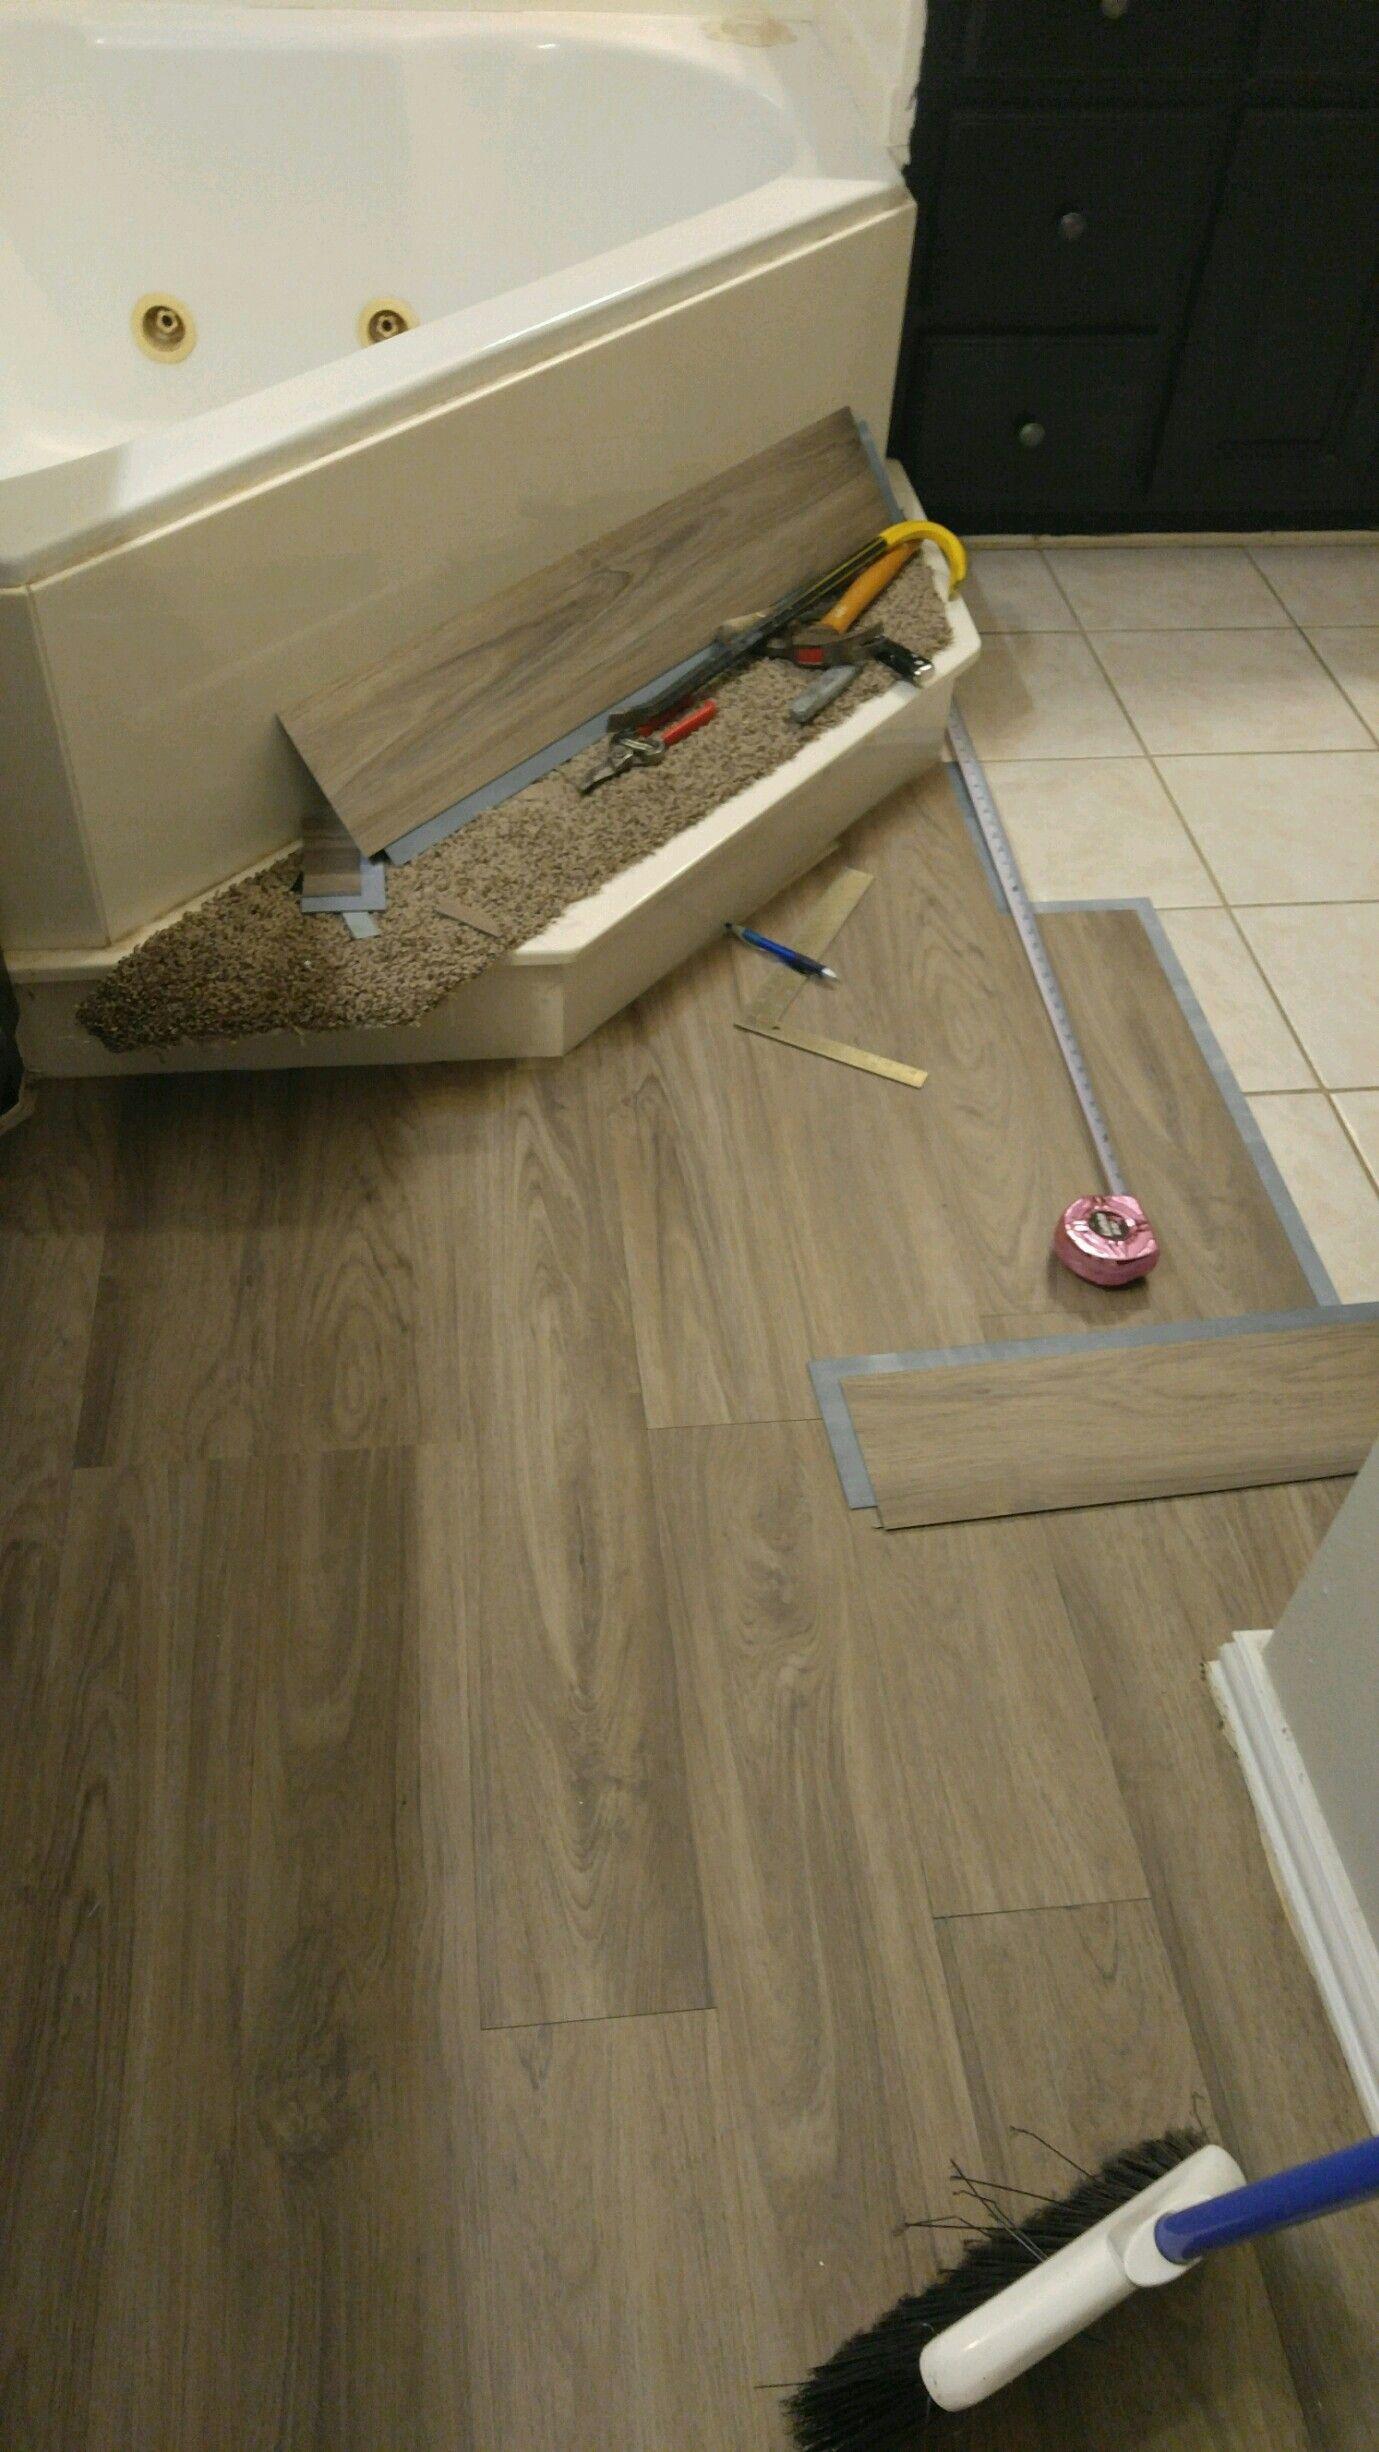 I Did This Myself Vinyl Plank Flooring Over Tile Flooring Trends Vinyl Plank Flooring Diy Flooring